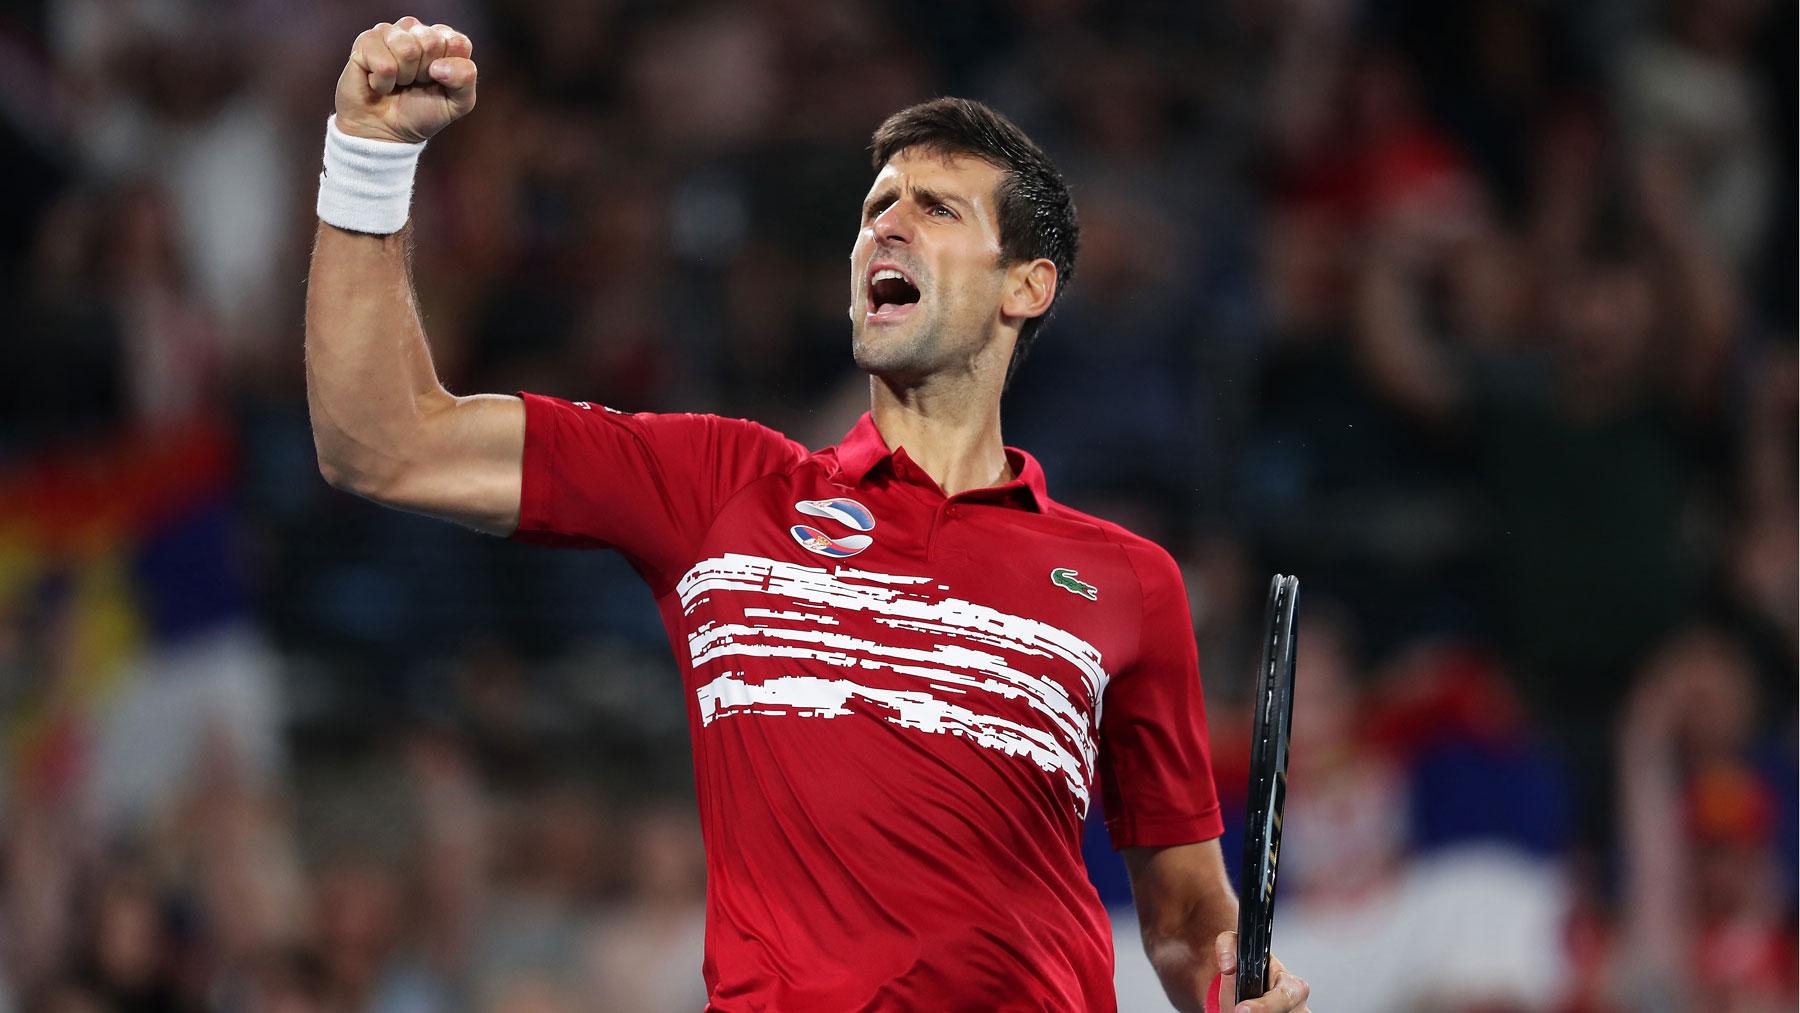 Djokovic estará en Tokio. (Getty)